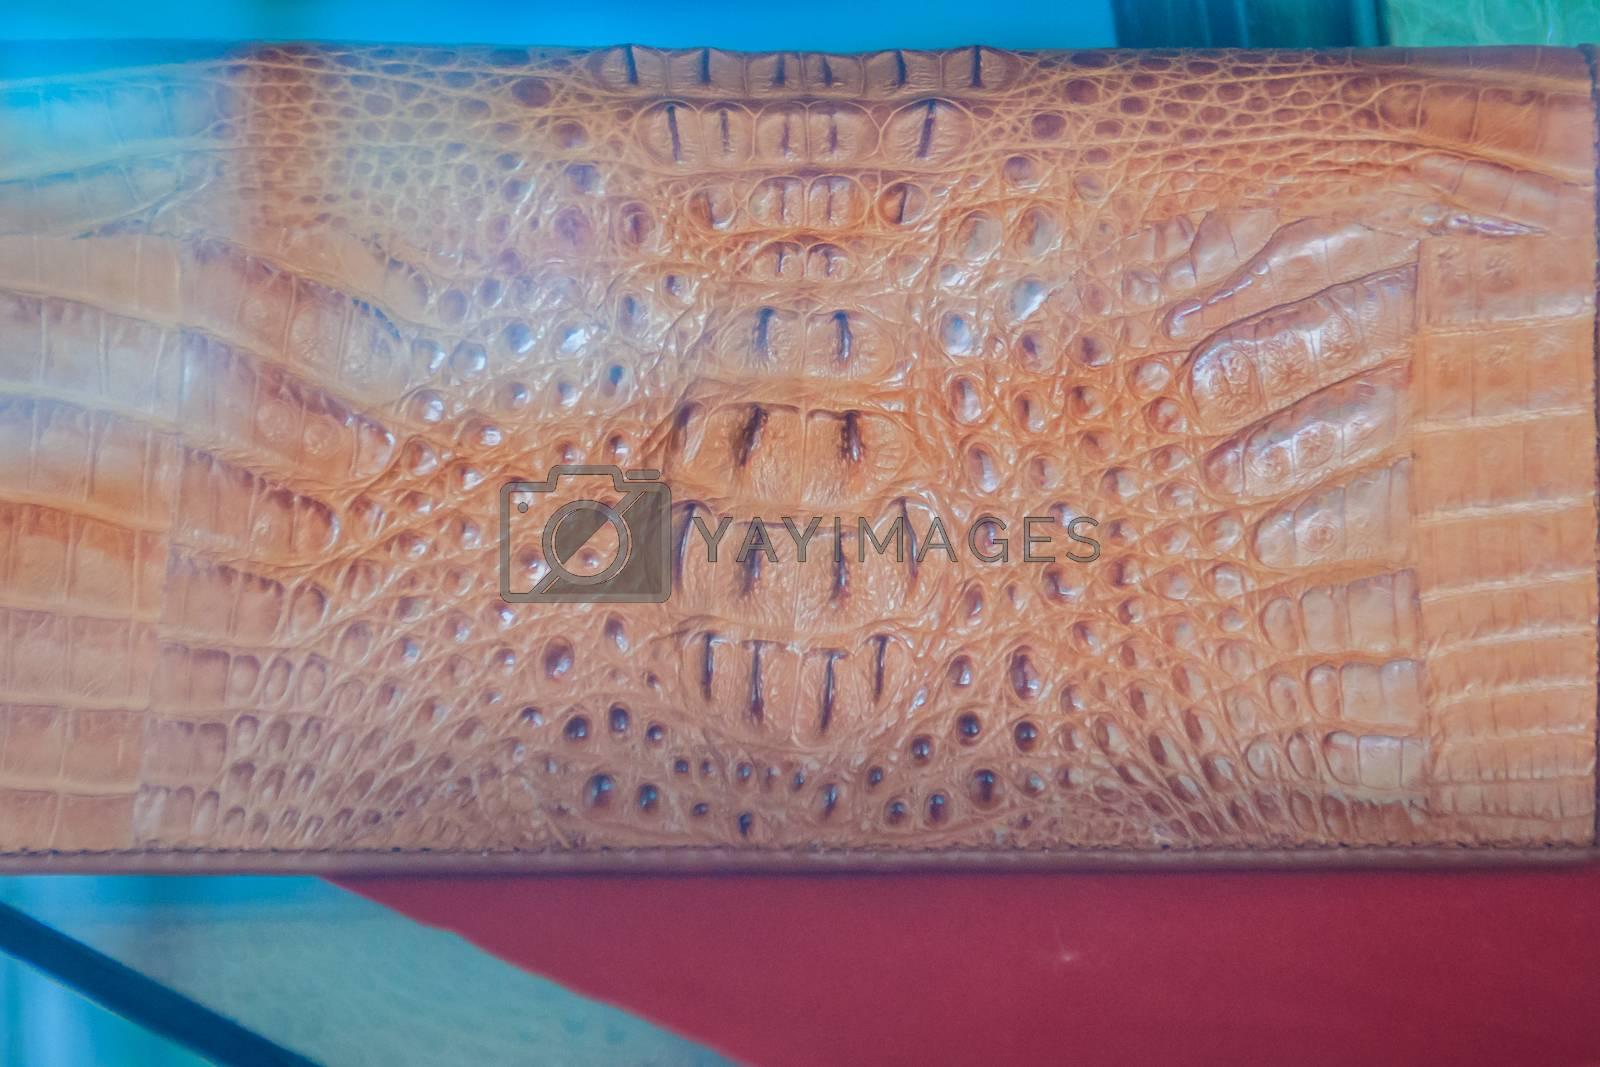 Beautiful brown crocodile leather handbag for sale in the luxury shop.